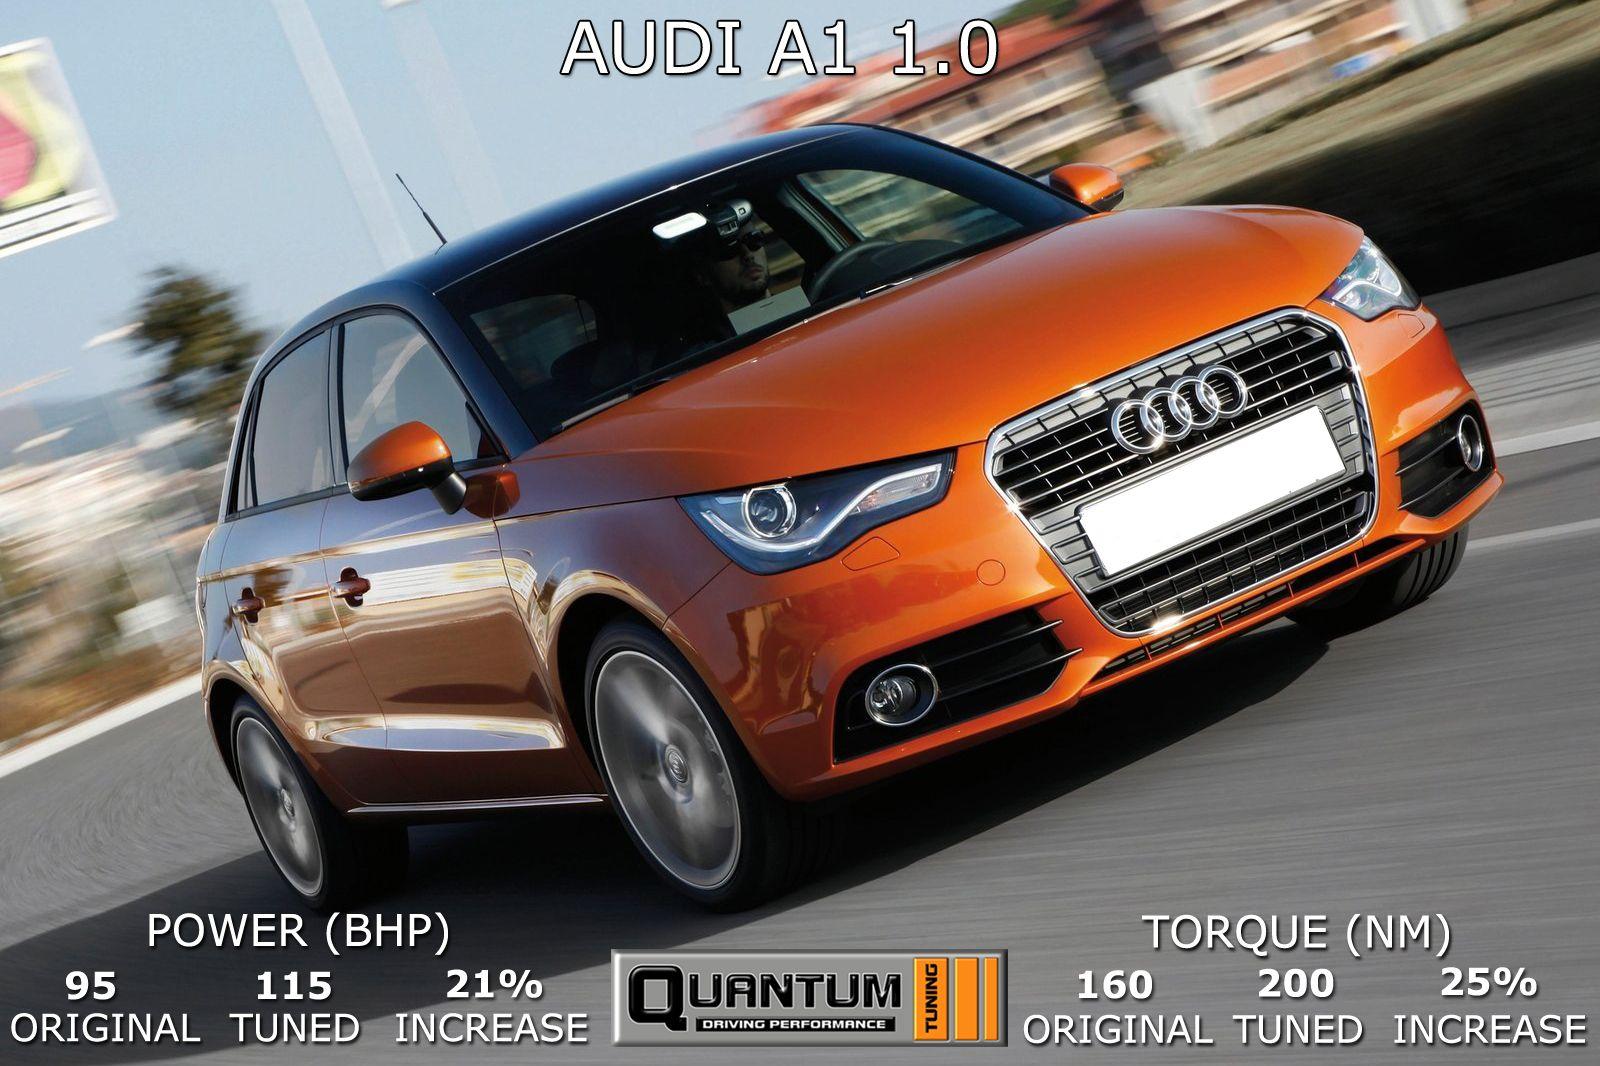 Audi A1 1 0 Tuned By Quantum Tuning Original 95 Bhp 160 Nm